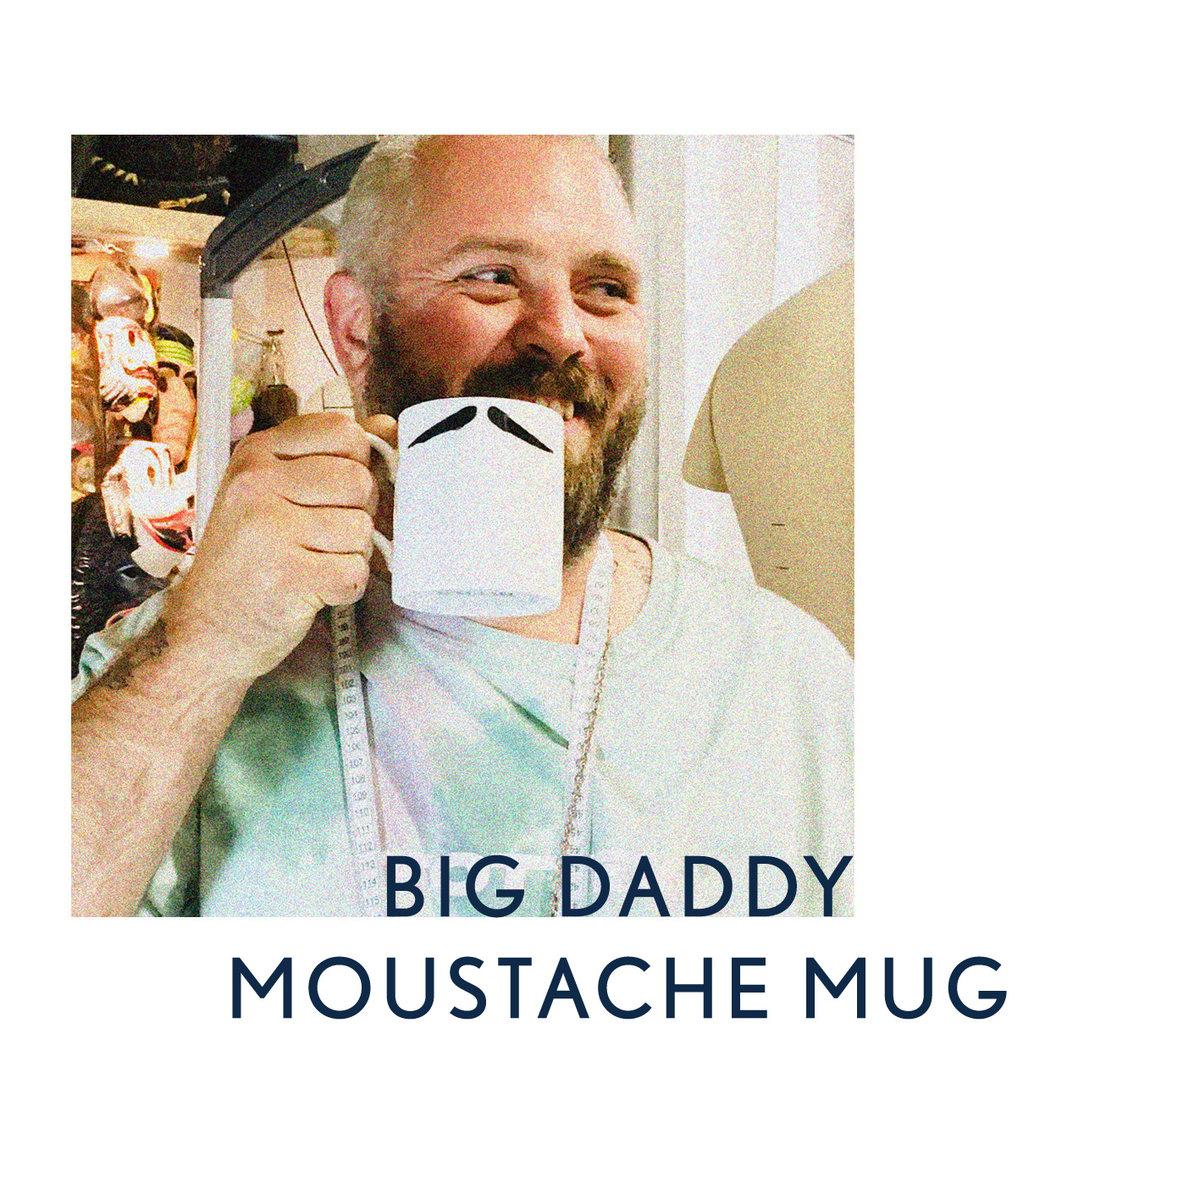 Image of Big Daddy Moustache Mug: INSPECTOR POIROT & MAURICE